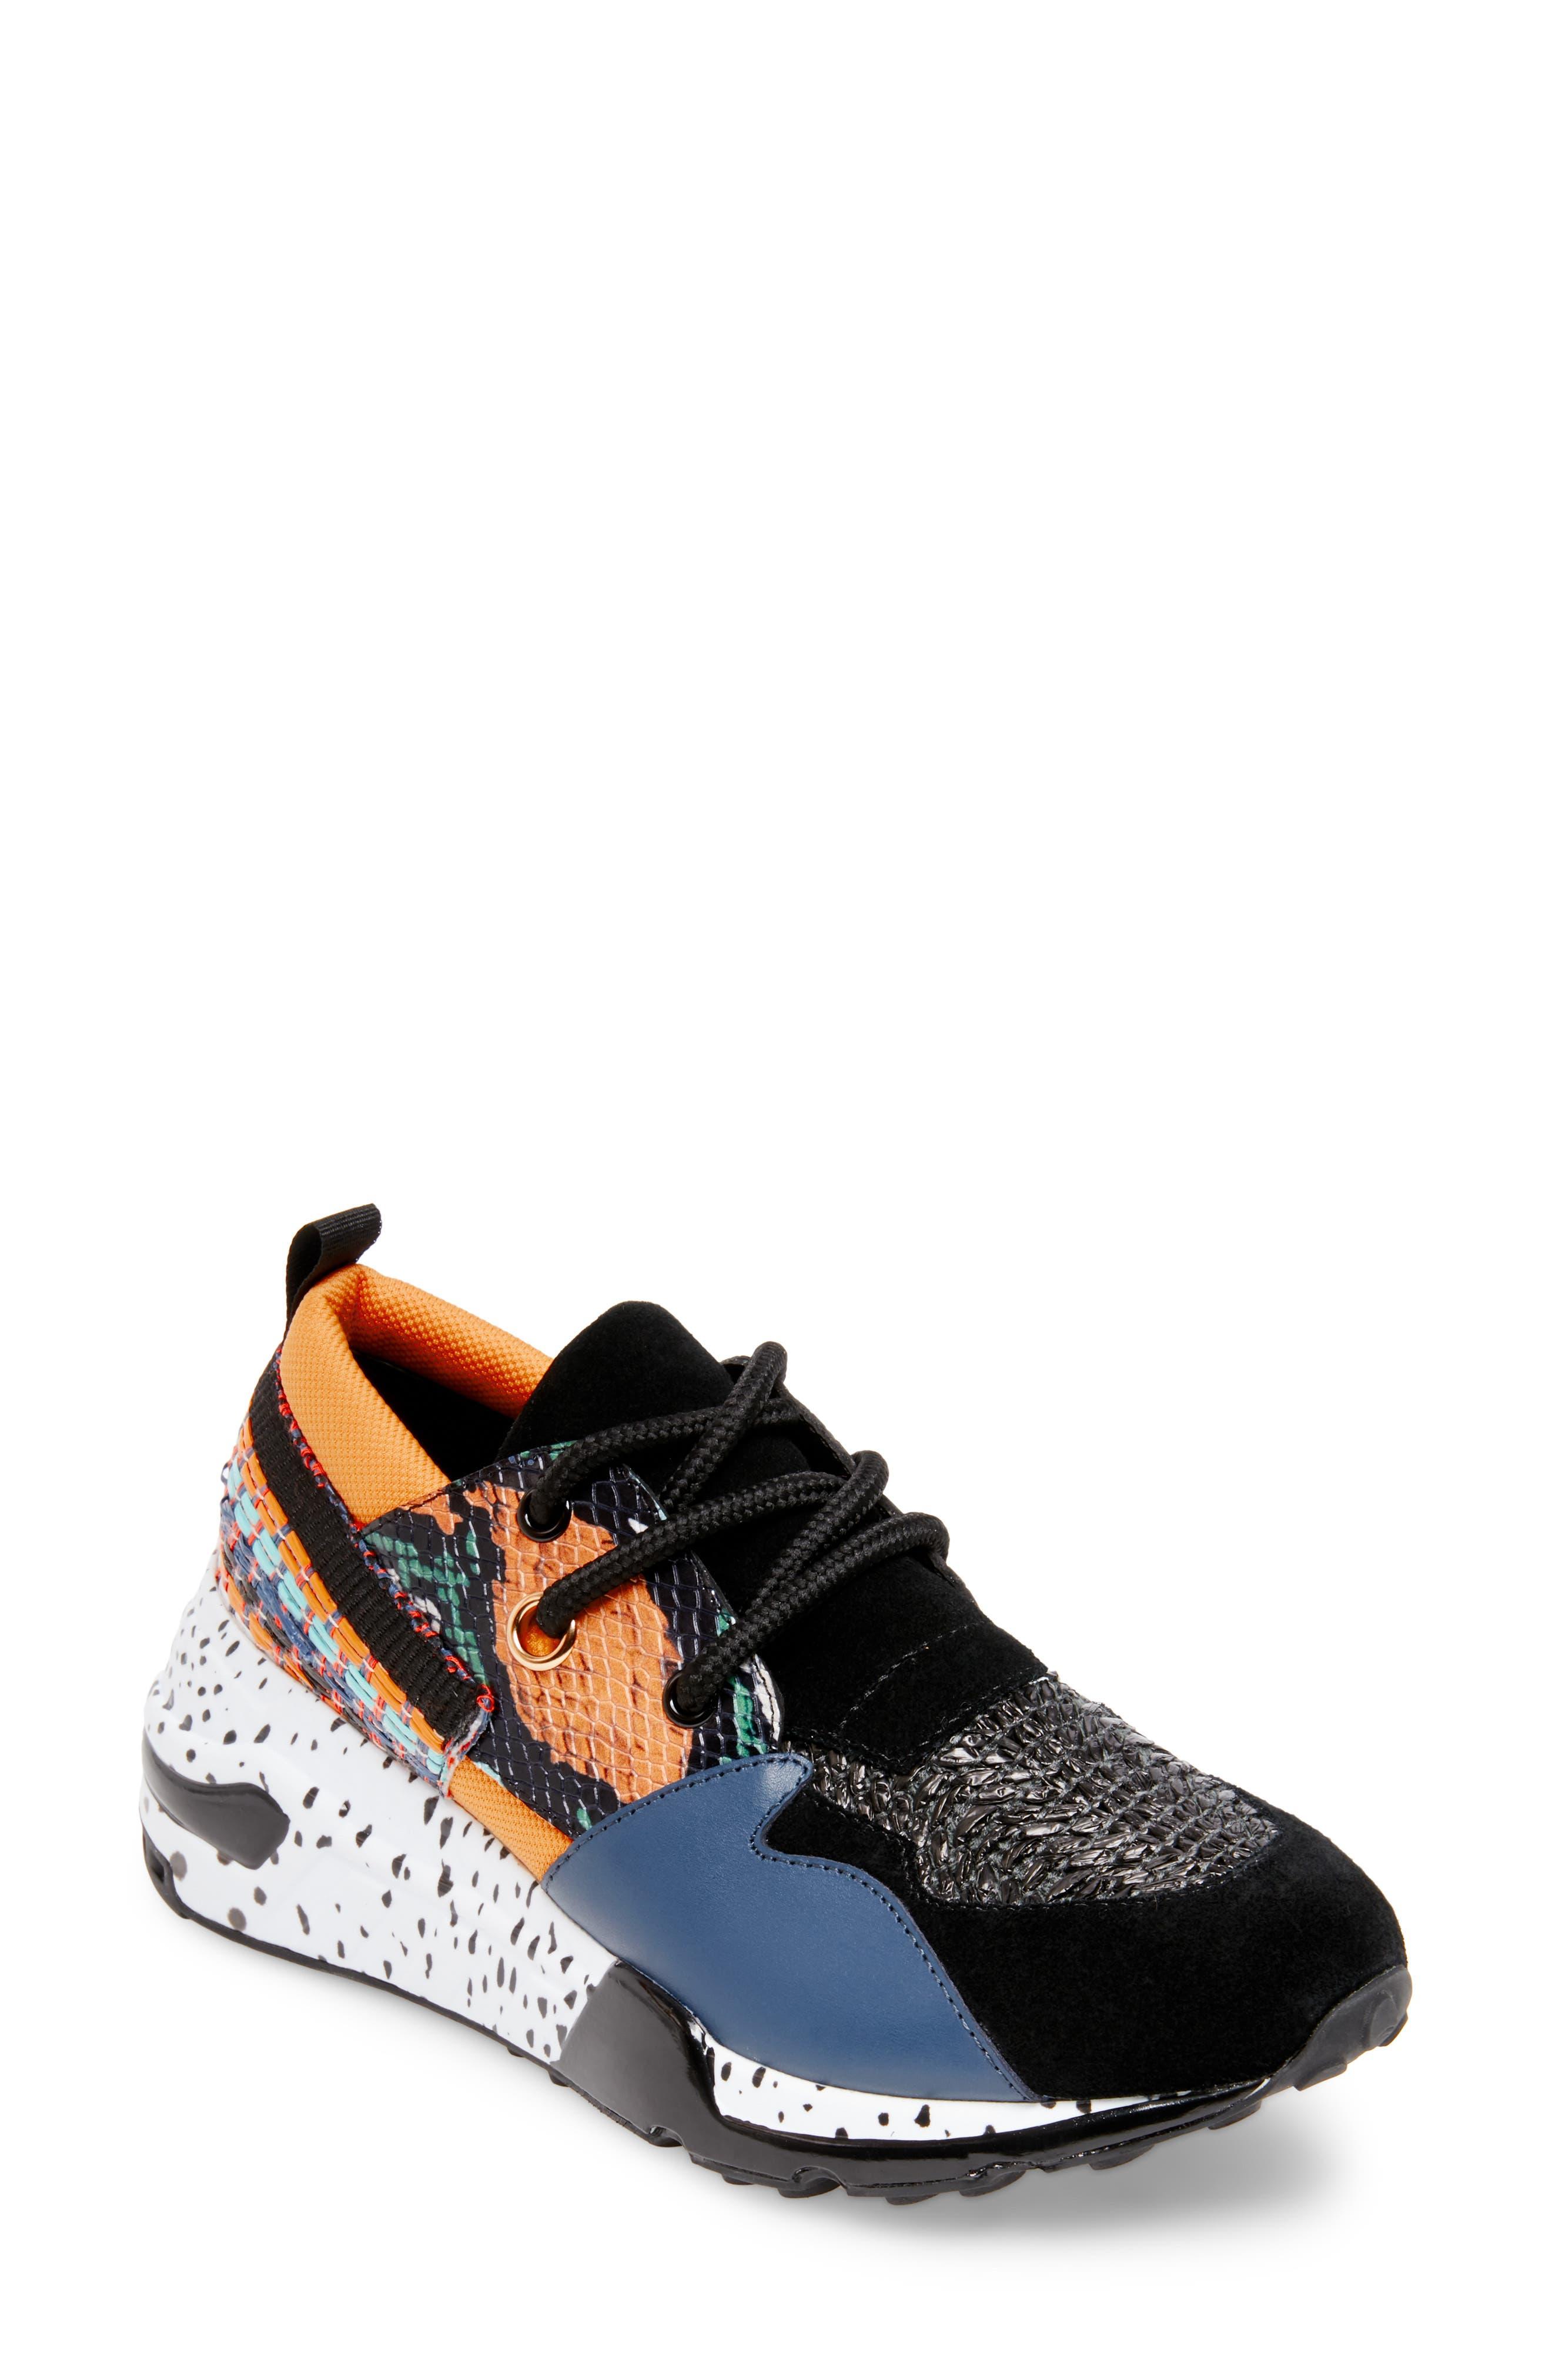 Cliff Sneaker,                             Main thumbnail 1, color,                             ORANGE MULTICOLOR